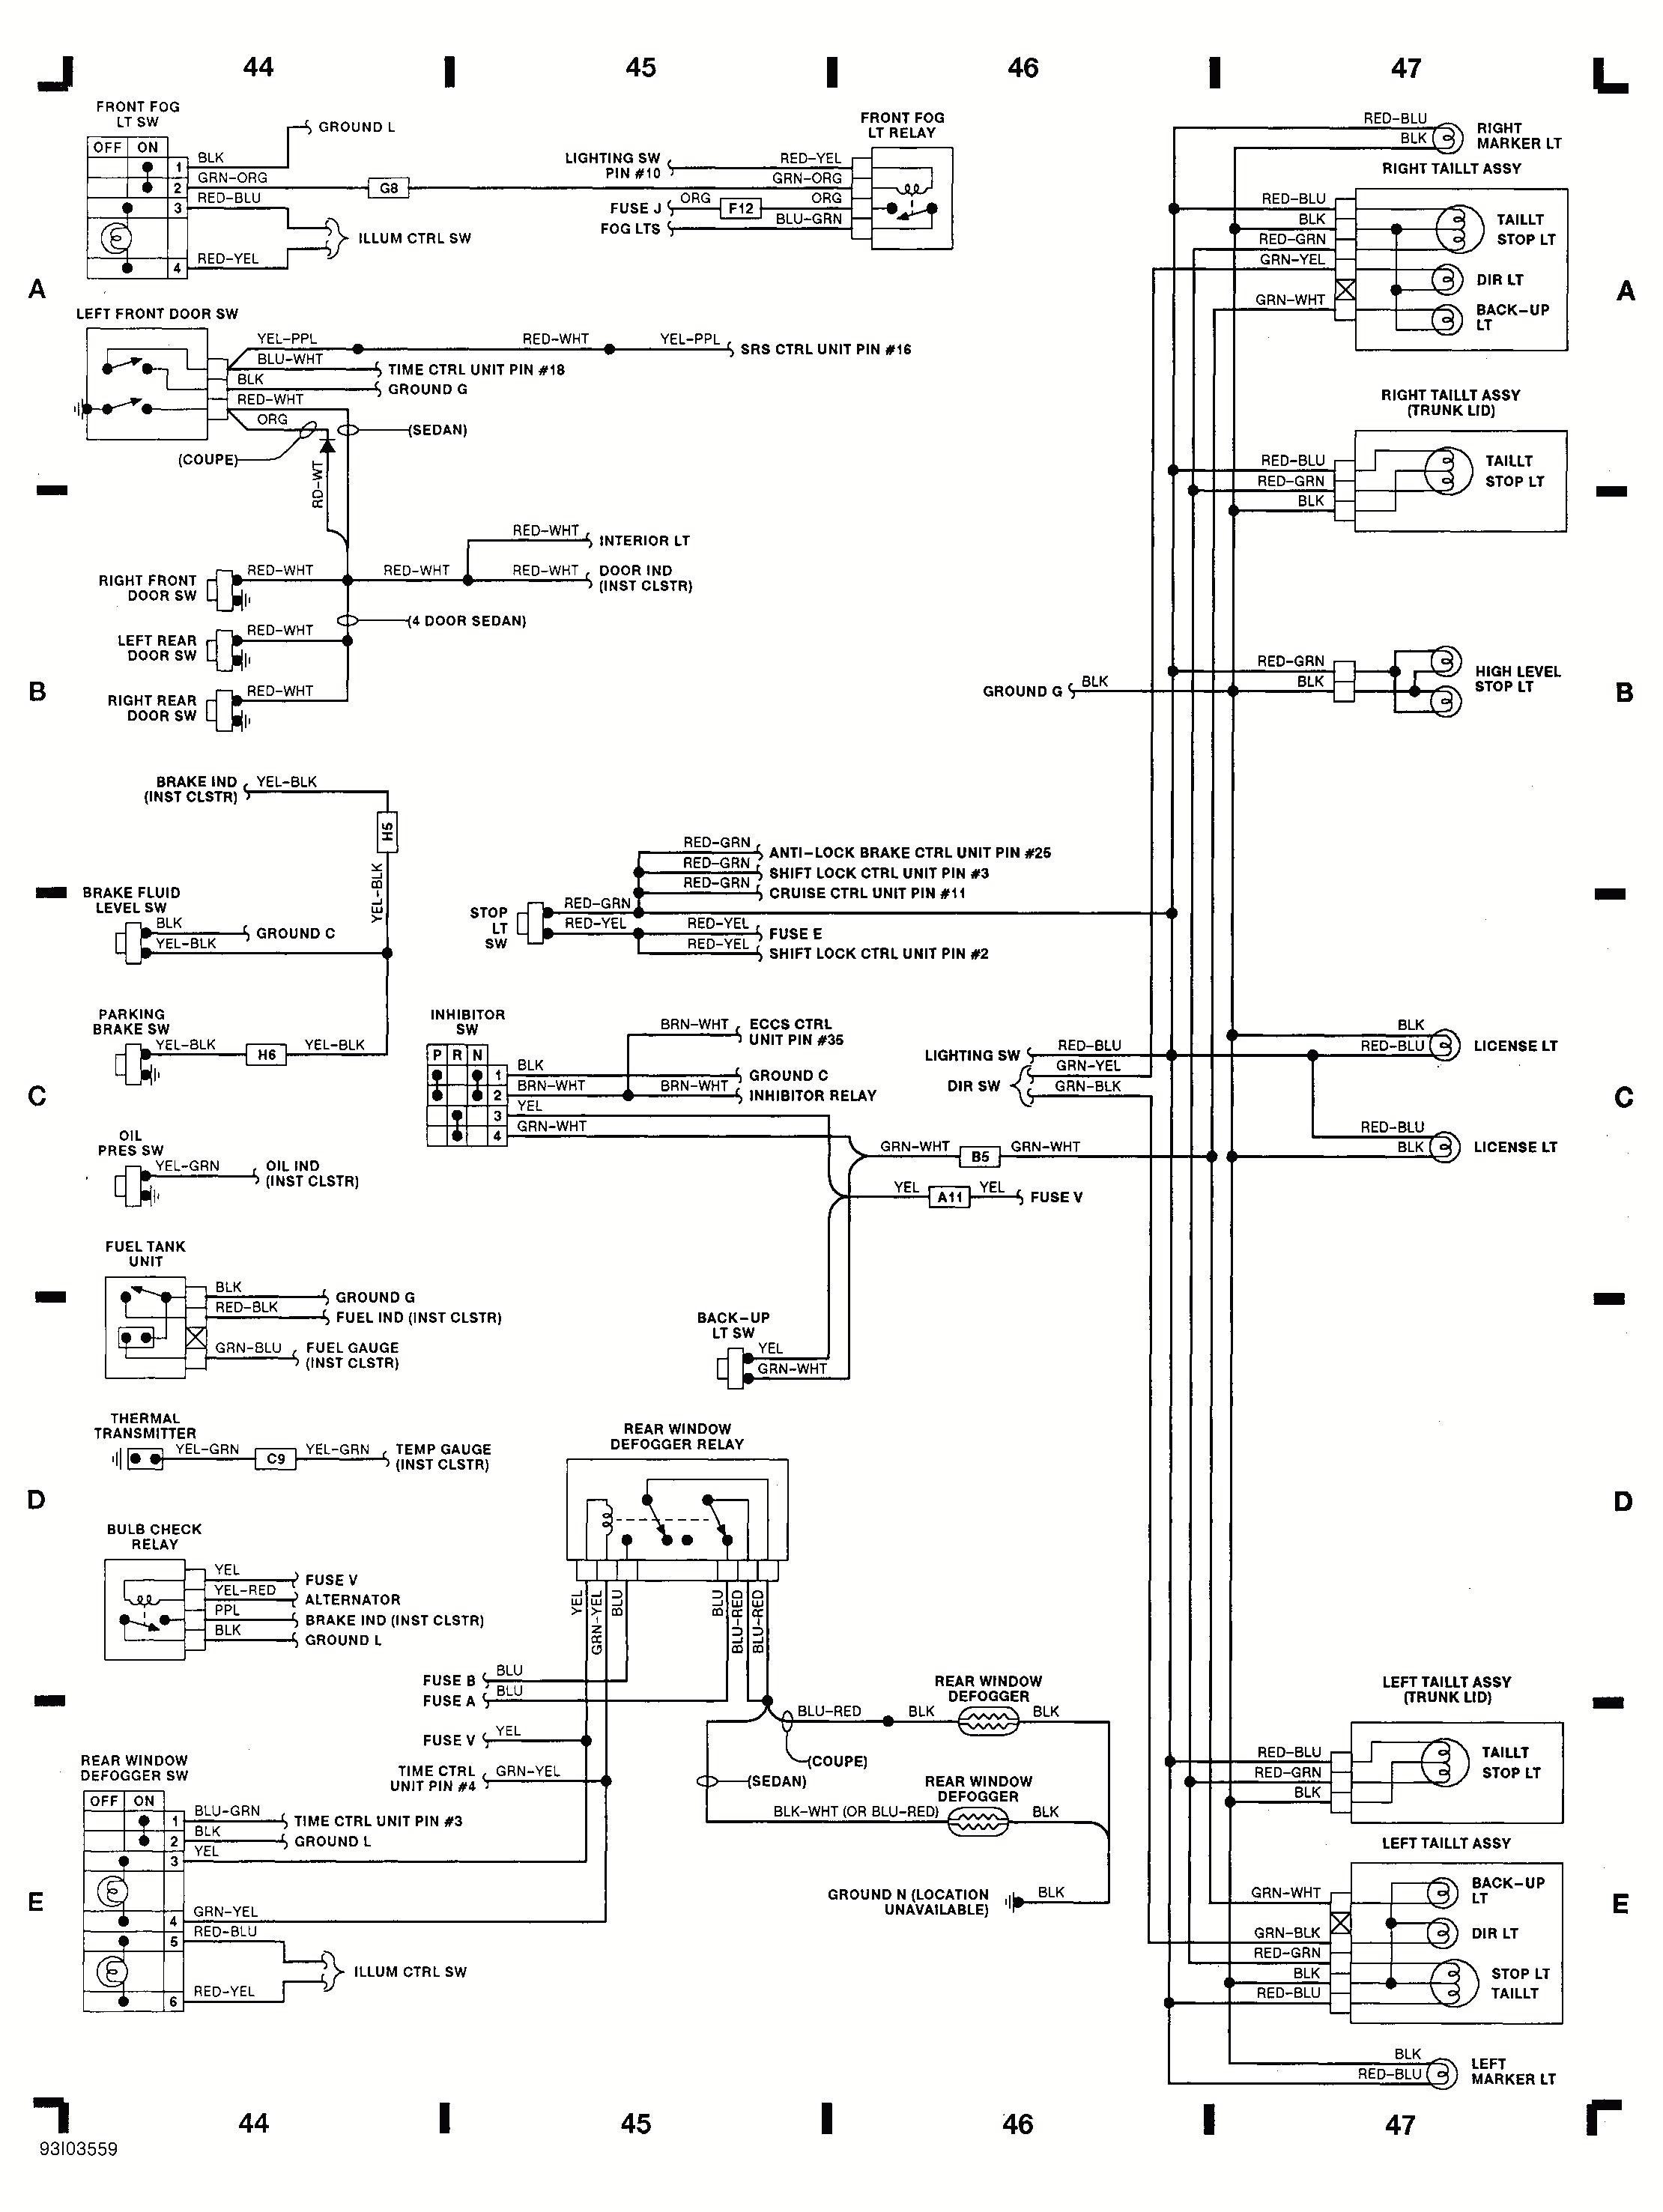 2009 Nissan Cube Fuse Box Diagram Toyota Camry Starter Motor Wiring Diagram Bullet Squier Corolla Waystar Fr